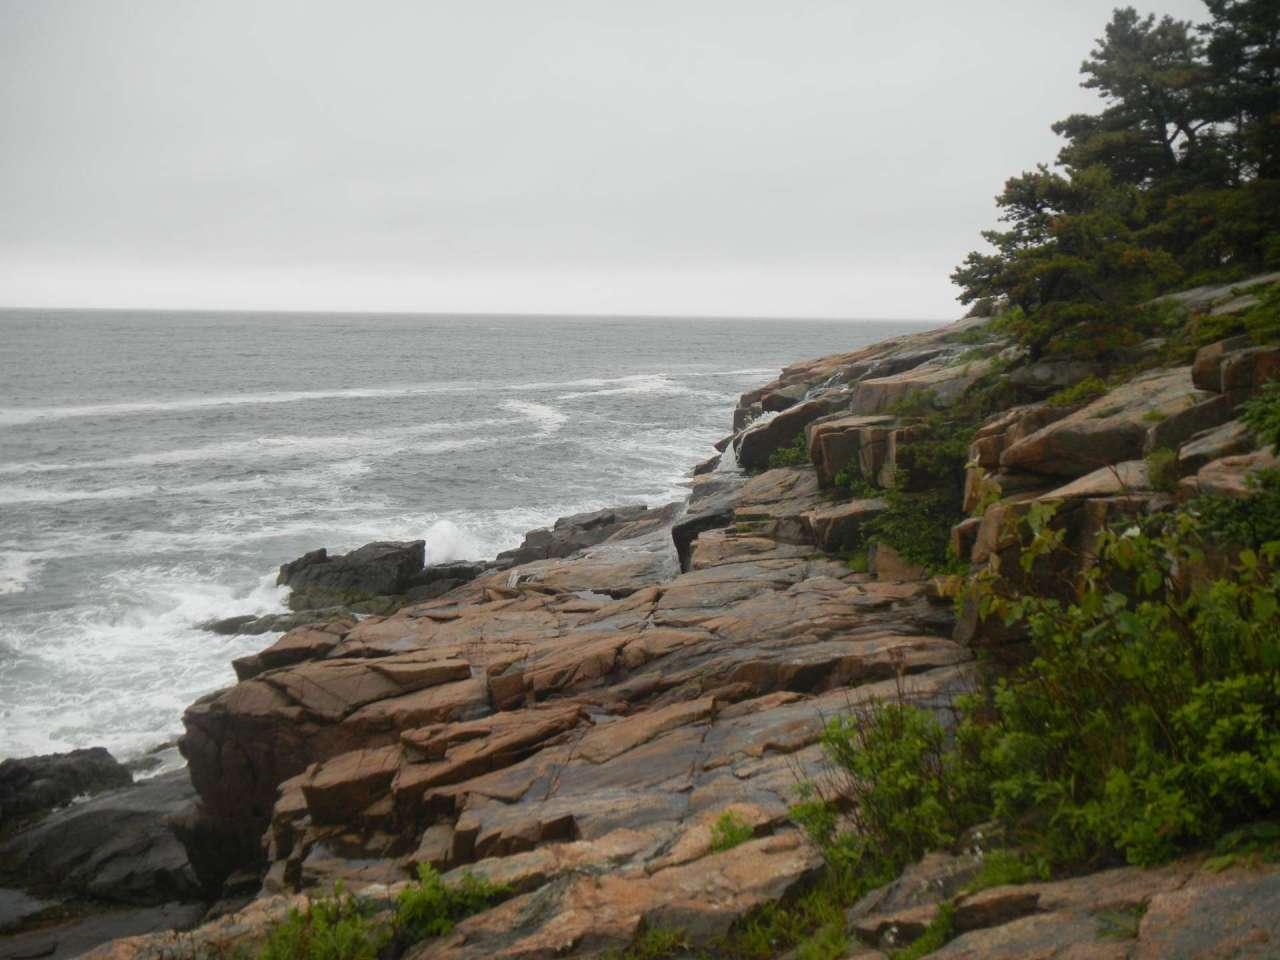 Overcast day, rocky coastline of Acadia National Park